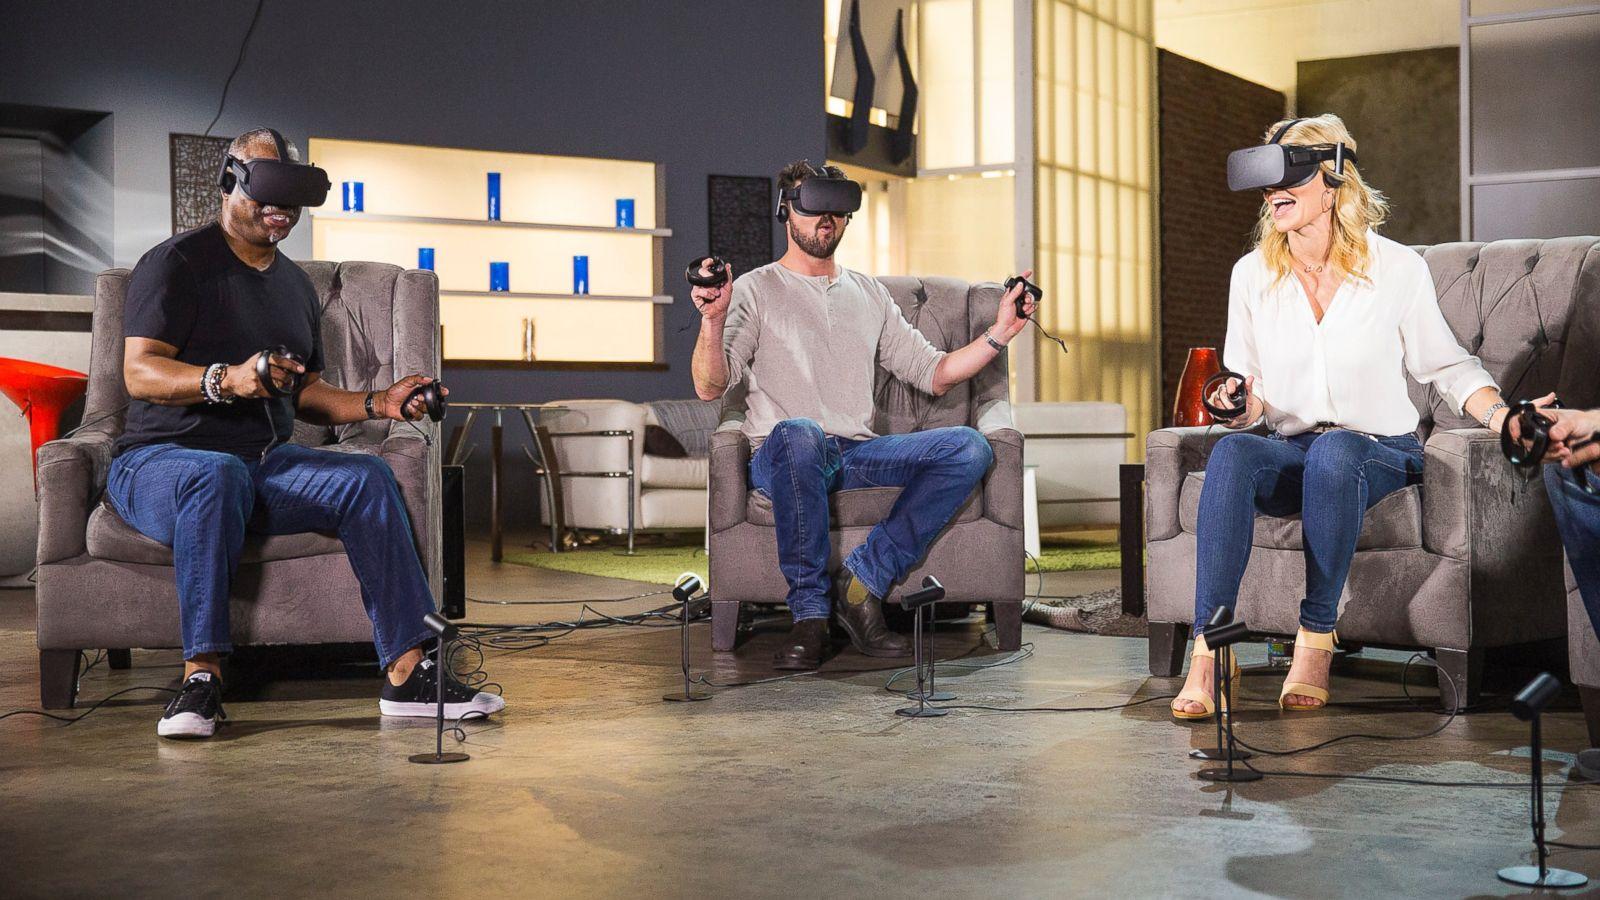 Image for Ubisoft dates VR games Eagle Flight, Star Trek: Bridge Crew, Werewolves Within